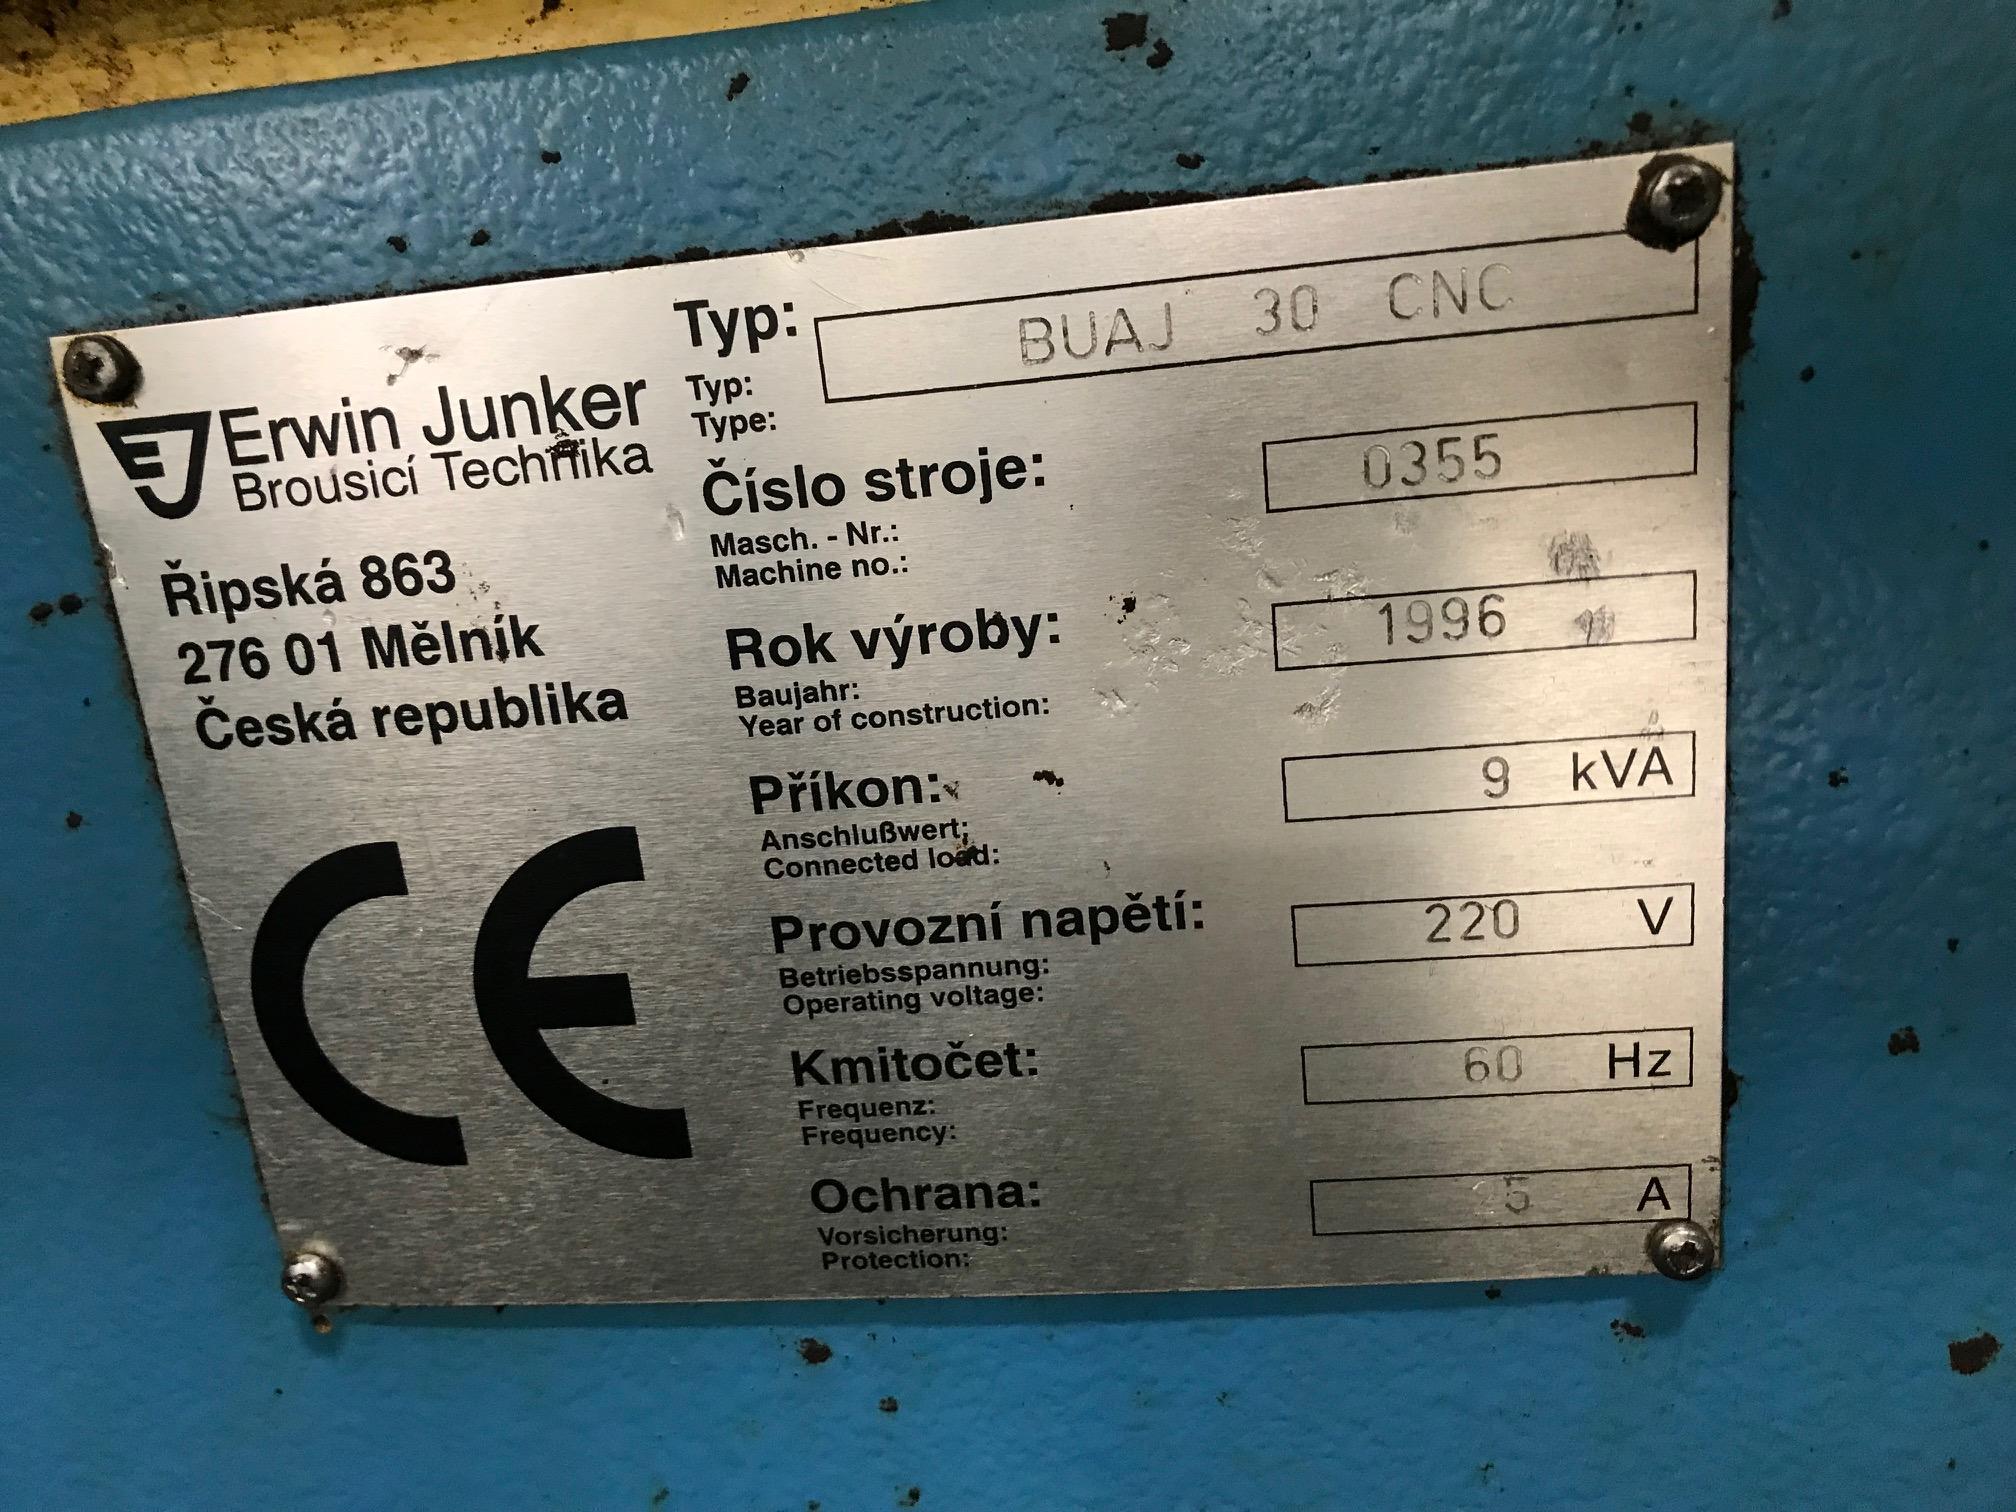 Lot 8 - ERWIN JUNKER CNC CYLINDRICAL GRINDER, MODEL BAUJ30, SN 0355, YEAR 1996, LOCATION IL